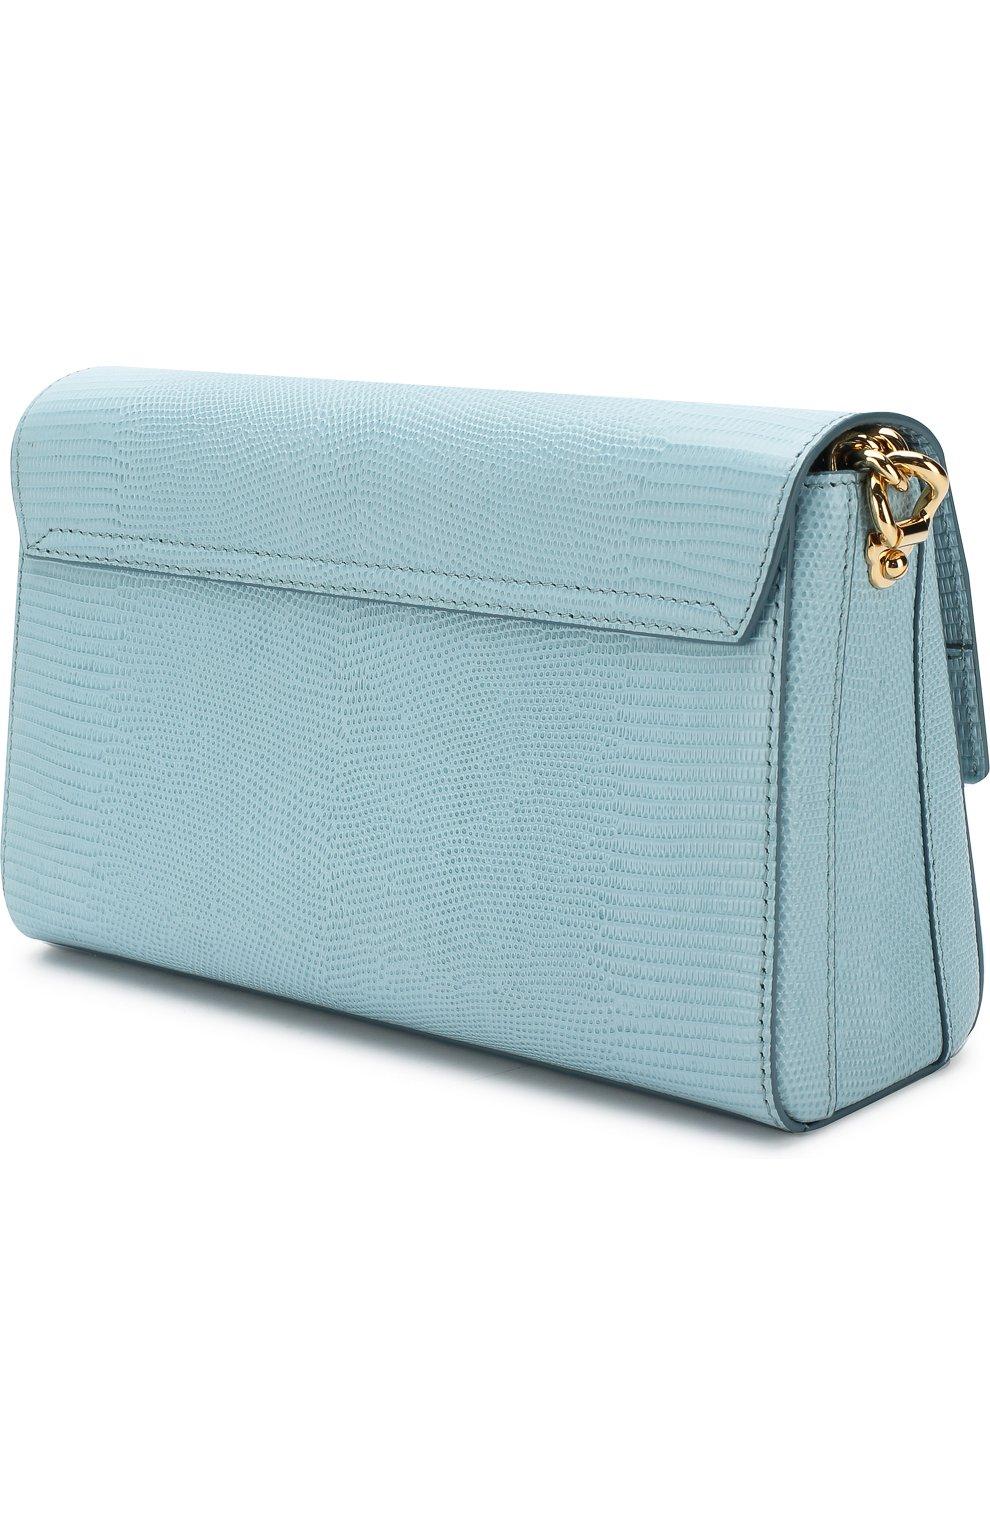 Сумка DG Millennials Dolce & Gabbana голубая цвета   Фото №3